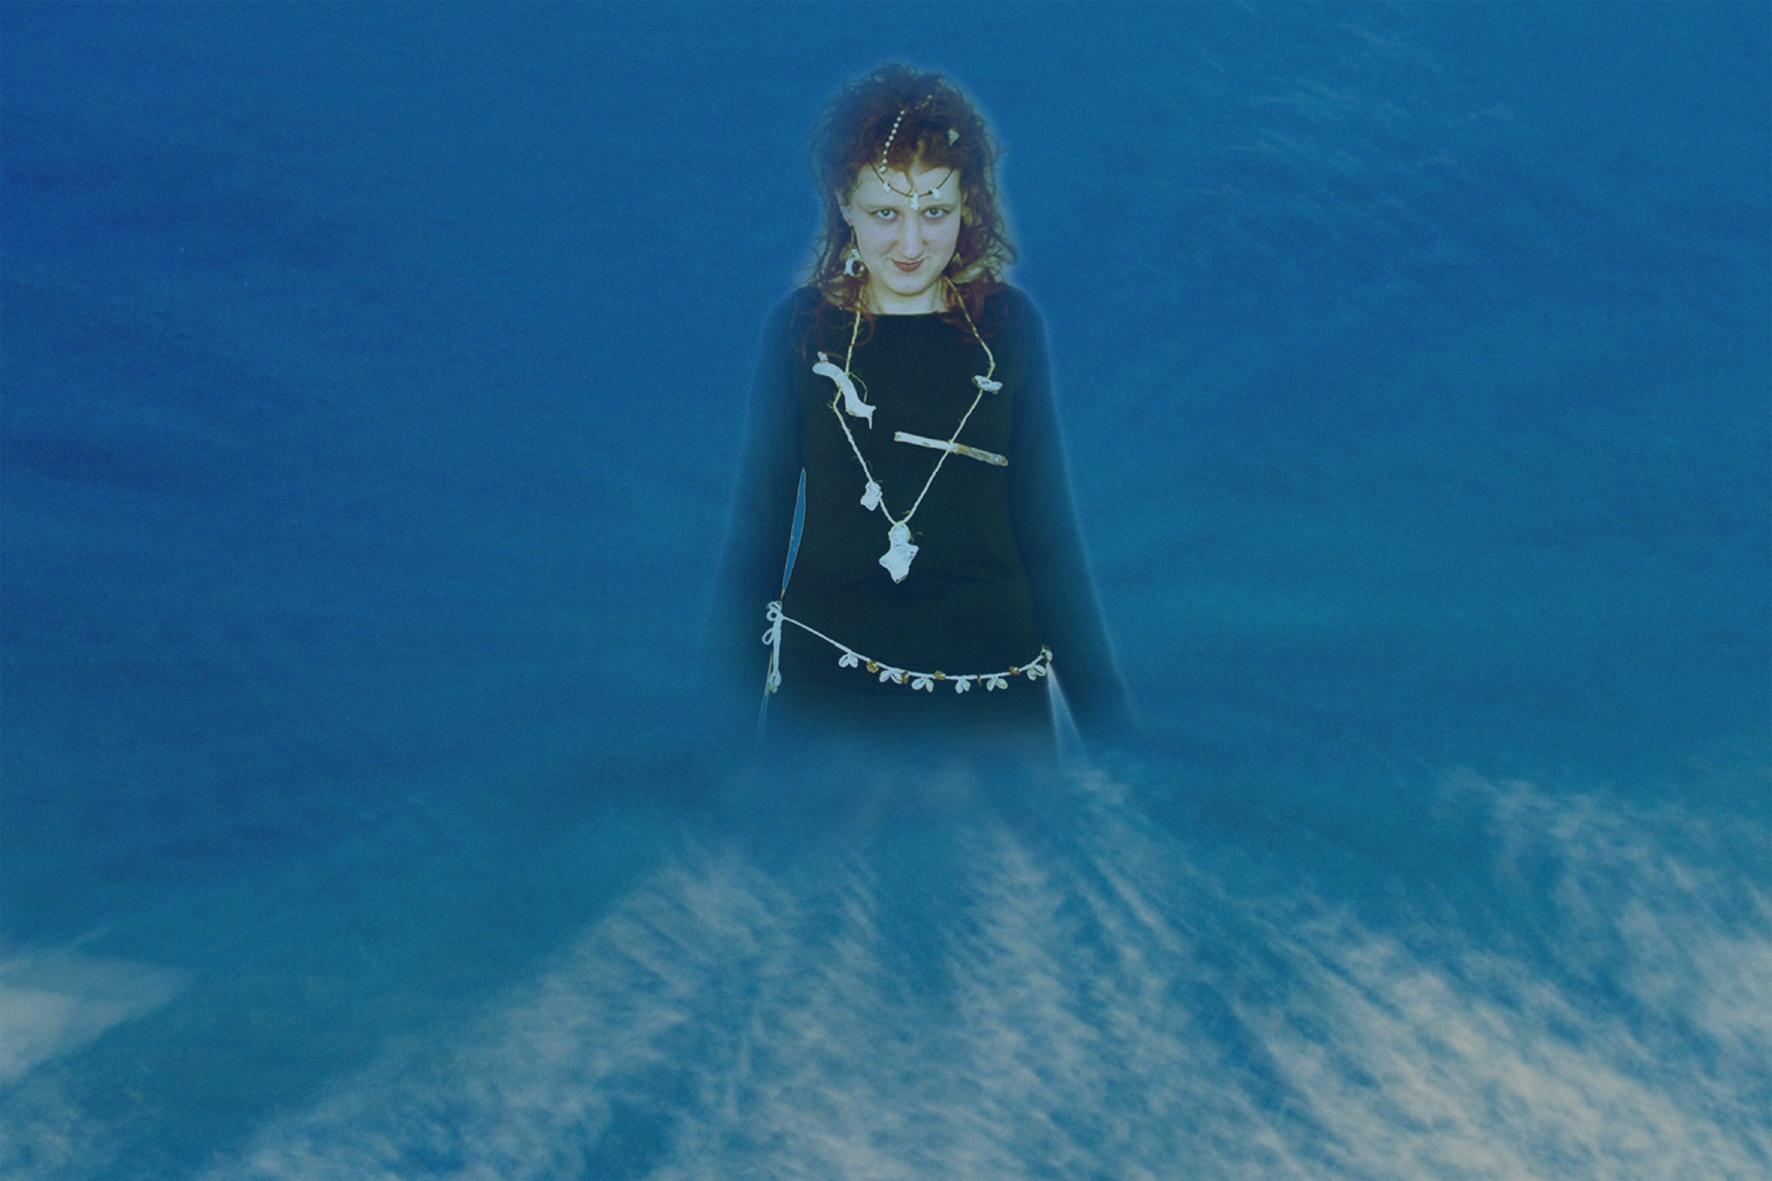 »Die Hexe des Meeres« (2003/04)